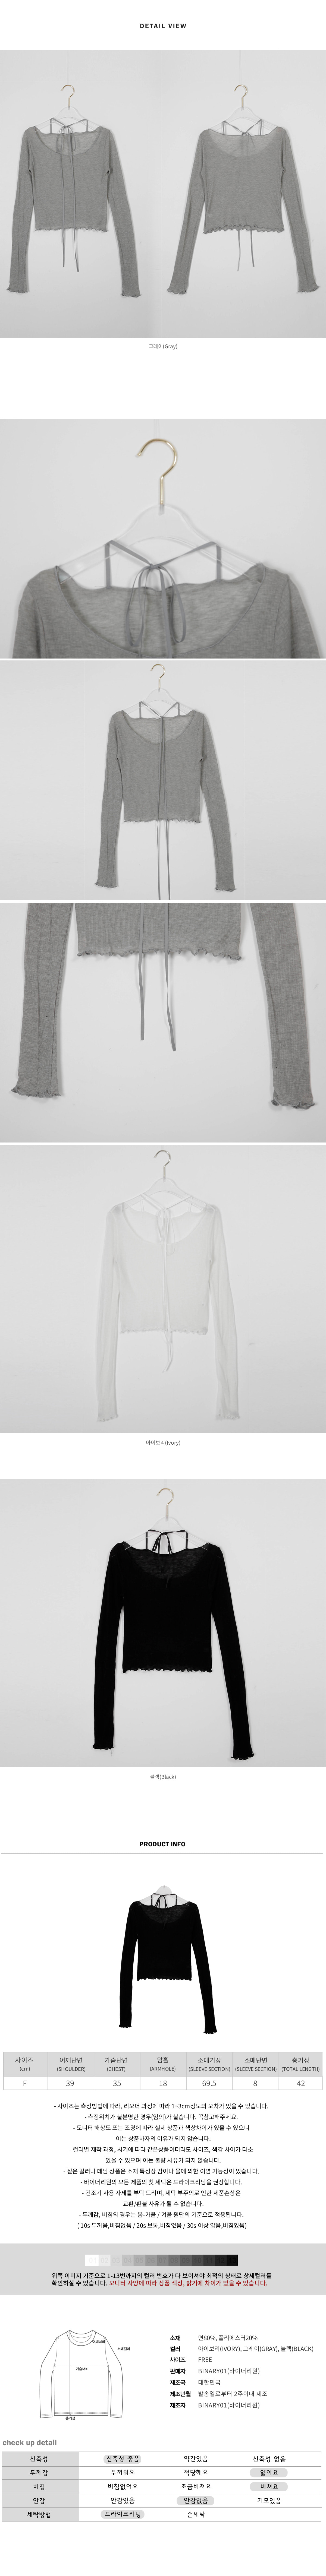 Ribbon Lily Strap T-shirt